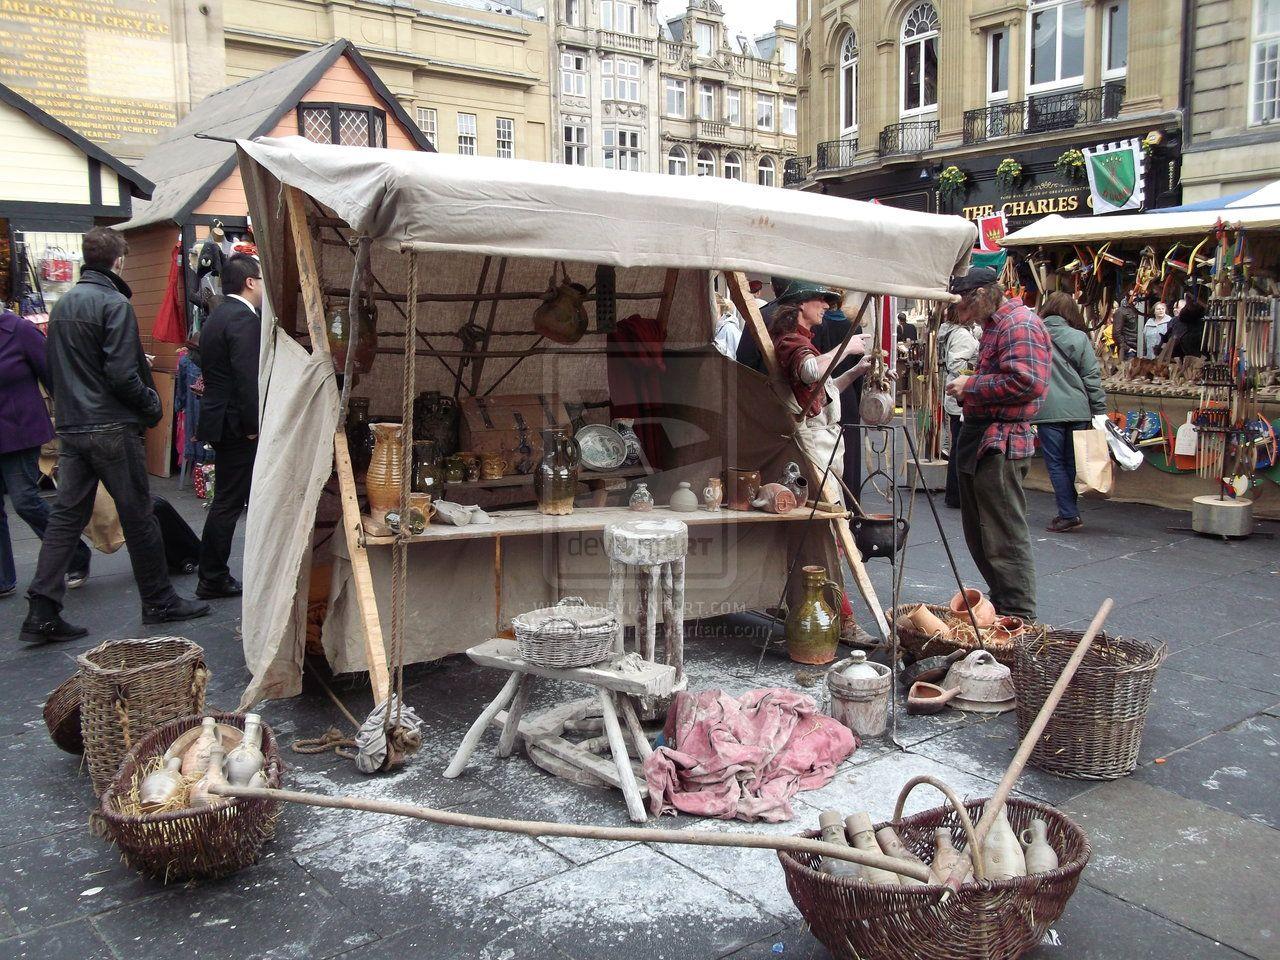 Parada Medieval Medieval Stall Pinterest Medieval